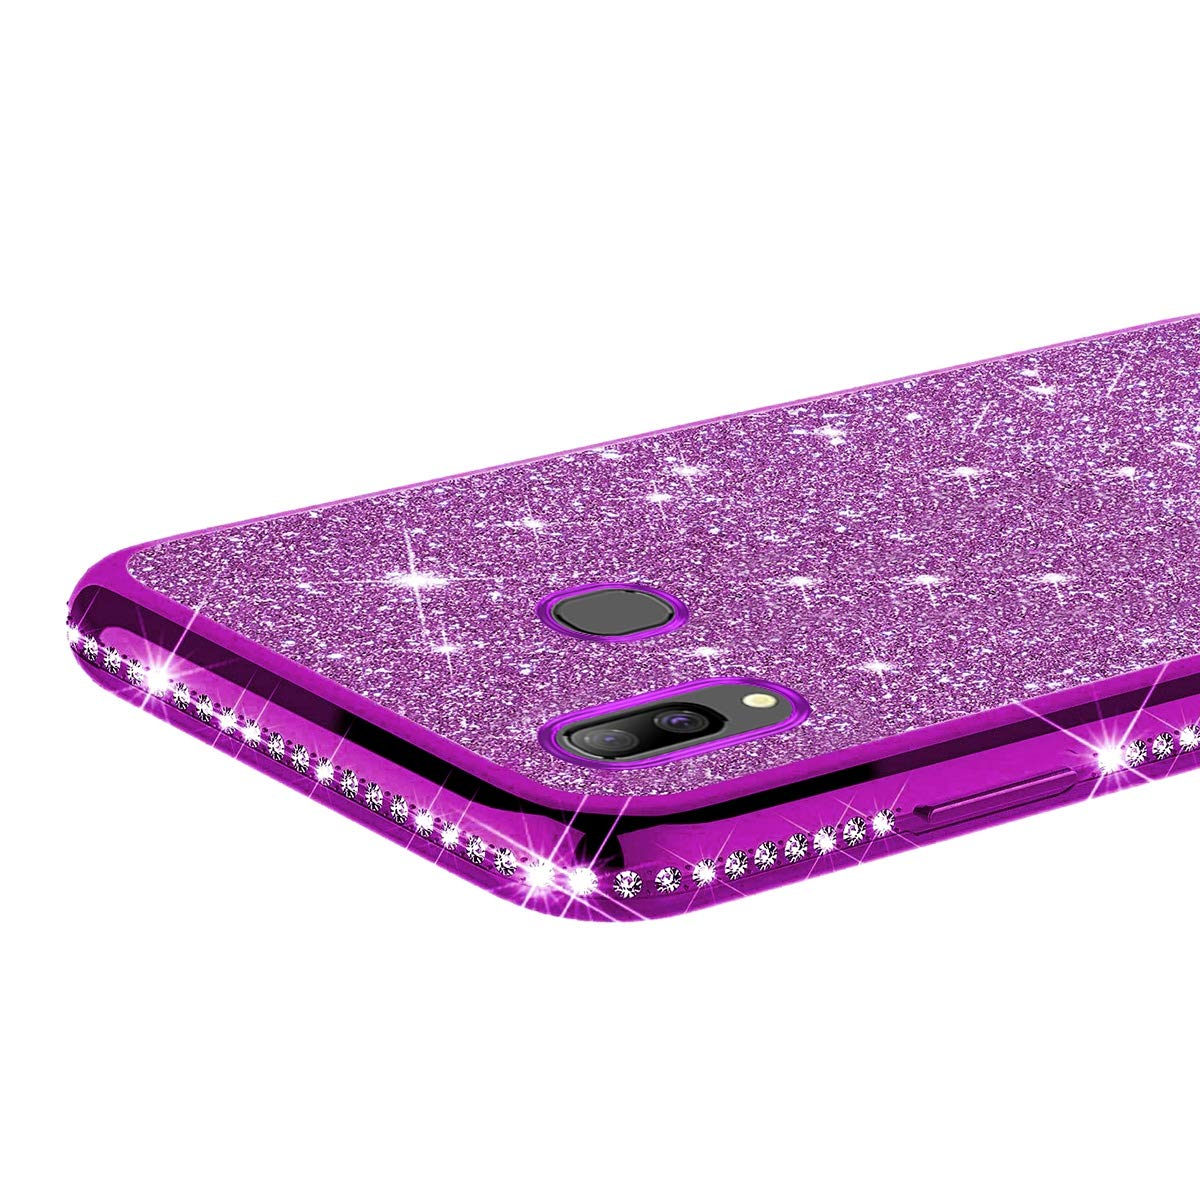 Hpory Coque Compatible avec Samsung Galaxy A40 Housse Etui Brillant Bling Paillettes Coque de Protection Diamant a Strass Case Cover TPU Silicone Bumper Case Ultra Mince Antichoc Etui,dor